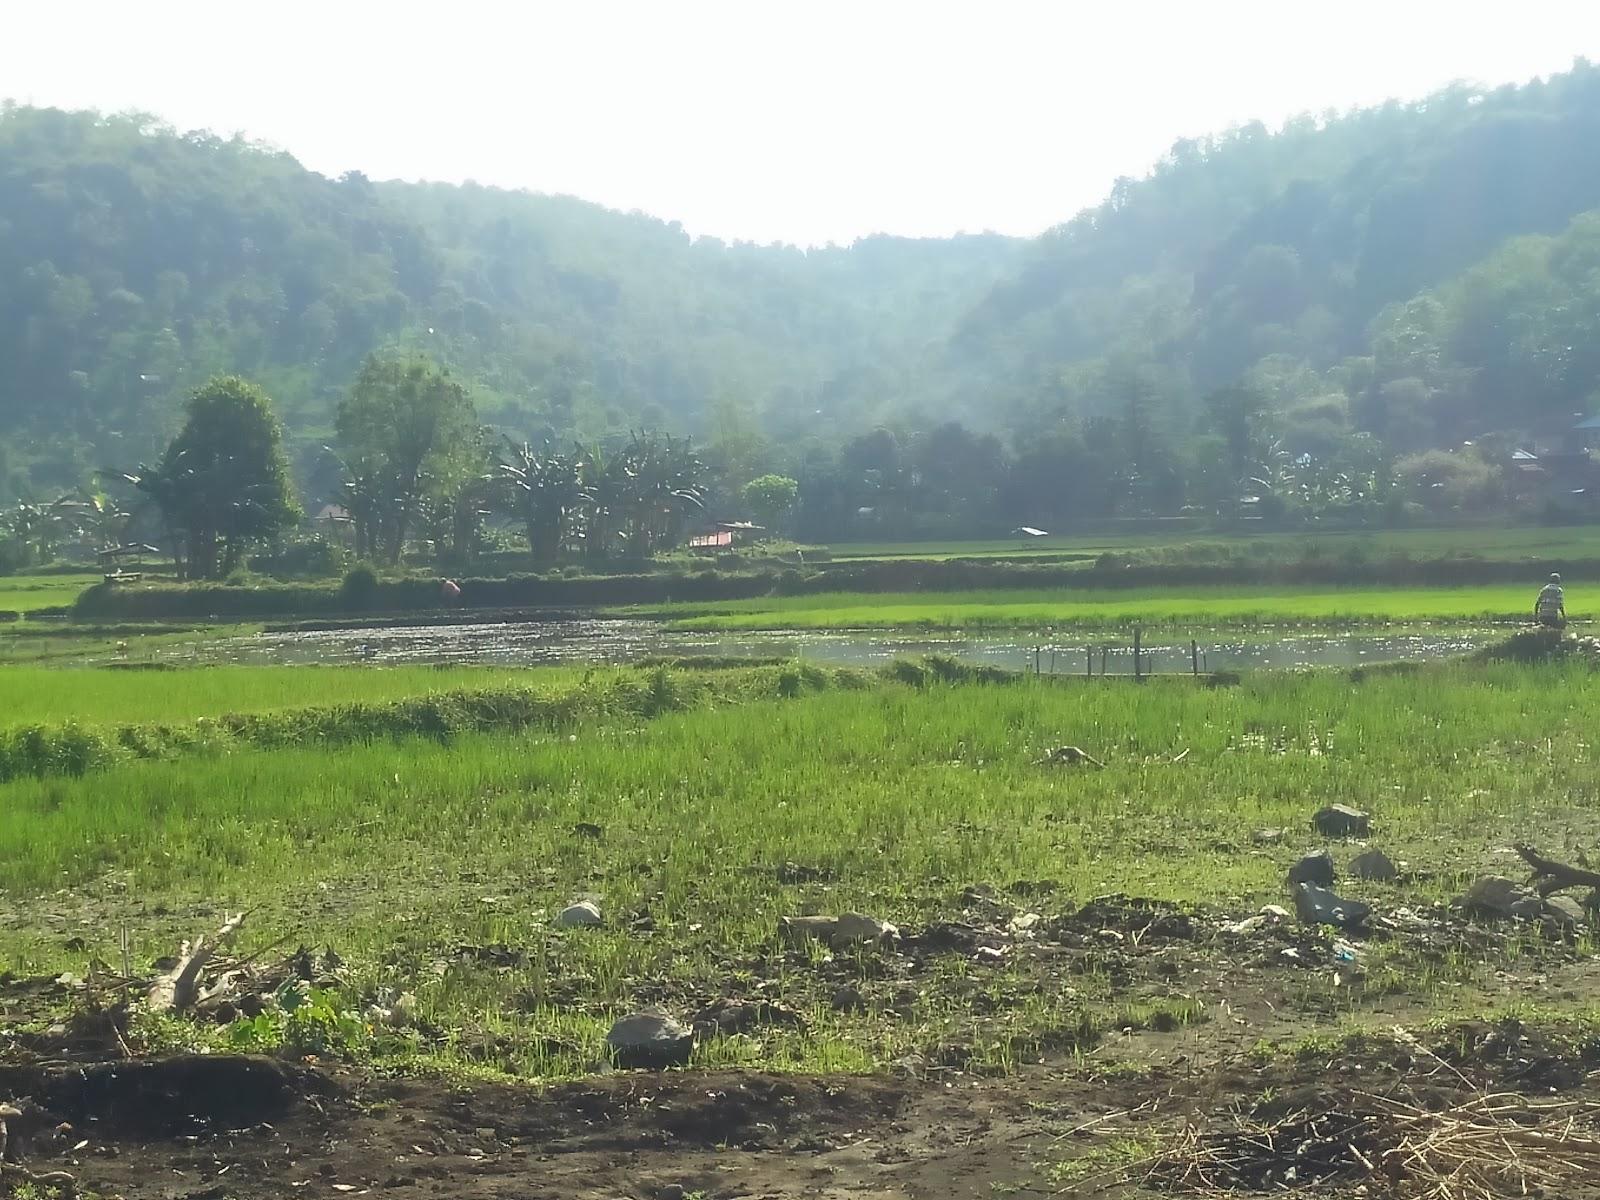 Kementerian Pertanian Ri Bagi 104 Ton Bibit Gratis Media Garda